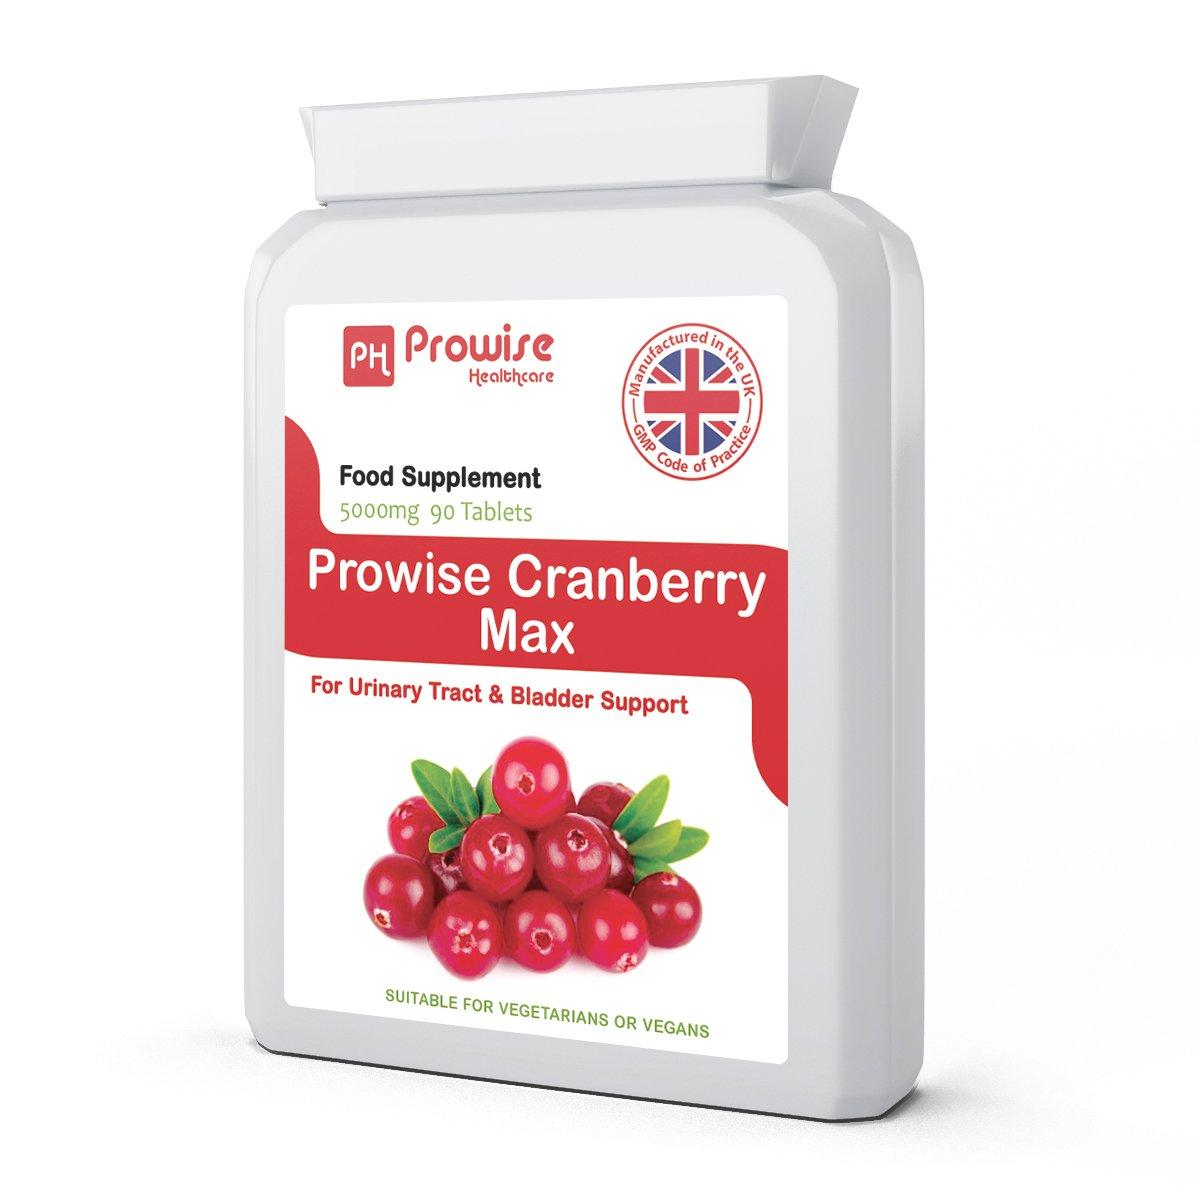 Prowise Cranberry 5000mg 90 comprimidos - Suplemento diario de alta resistencia - Reino Unido fabricado a GMP Calidad garantizada - Apto para vegetarianos y ...